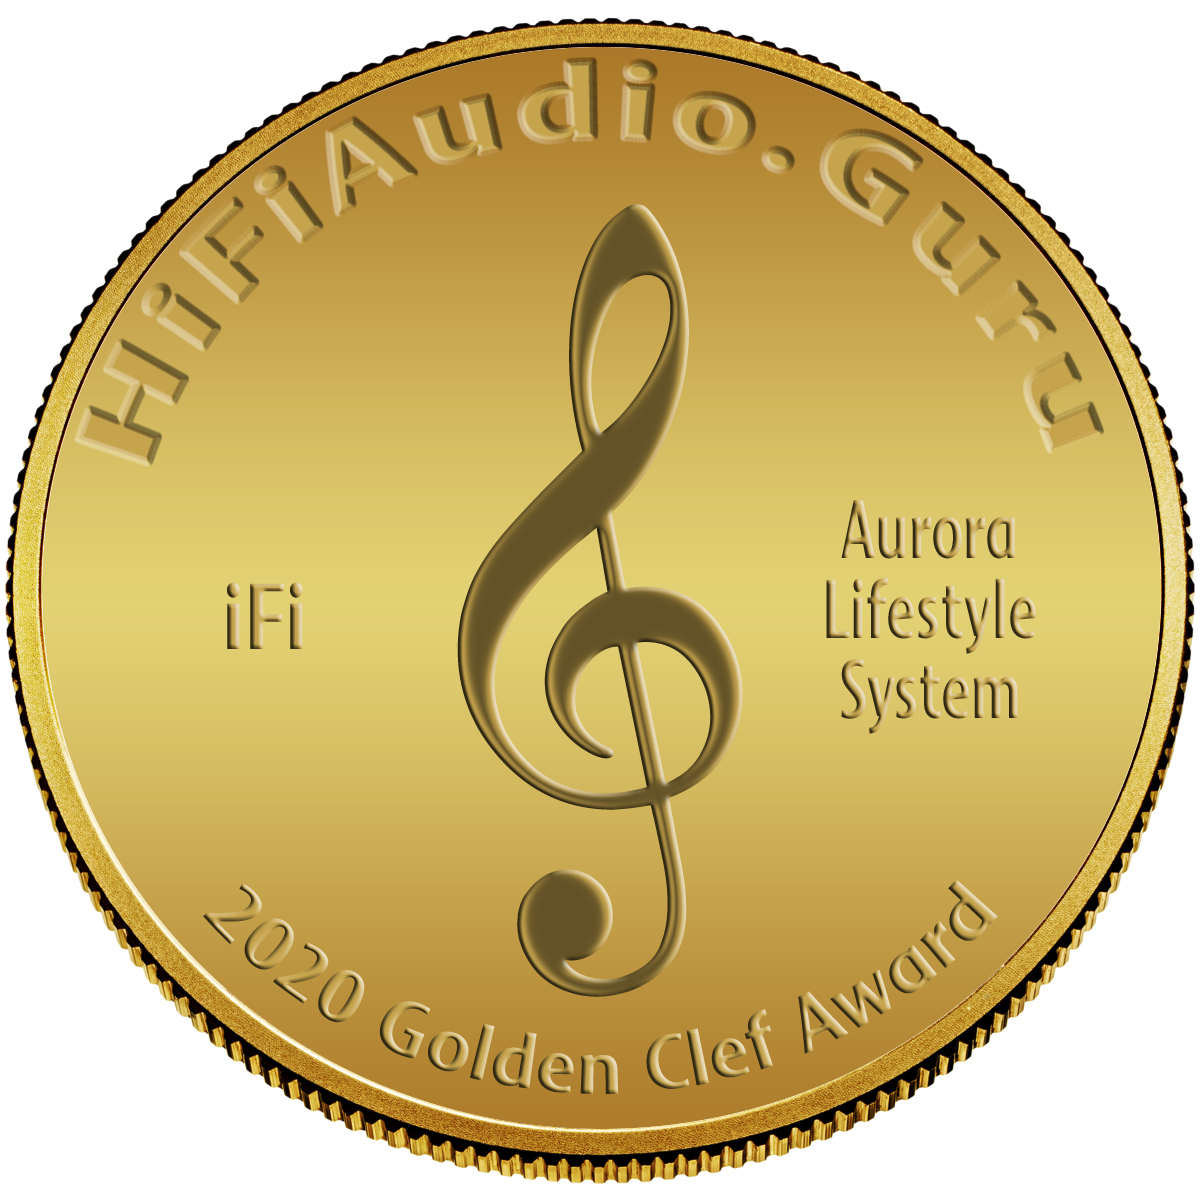 iFi Aurora Lifestyle System